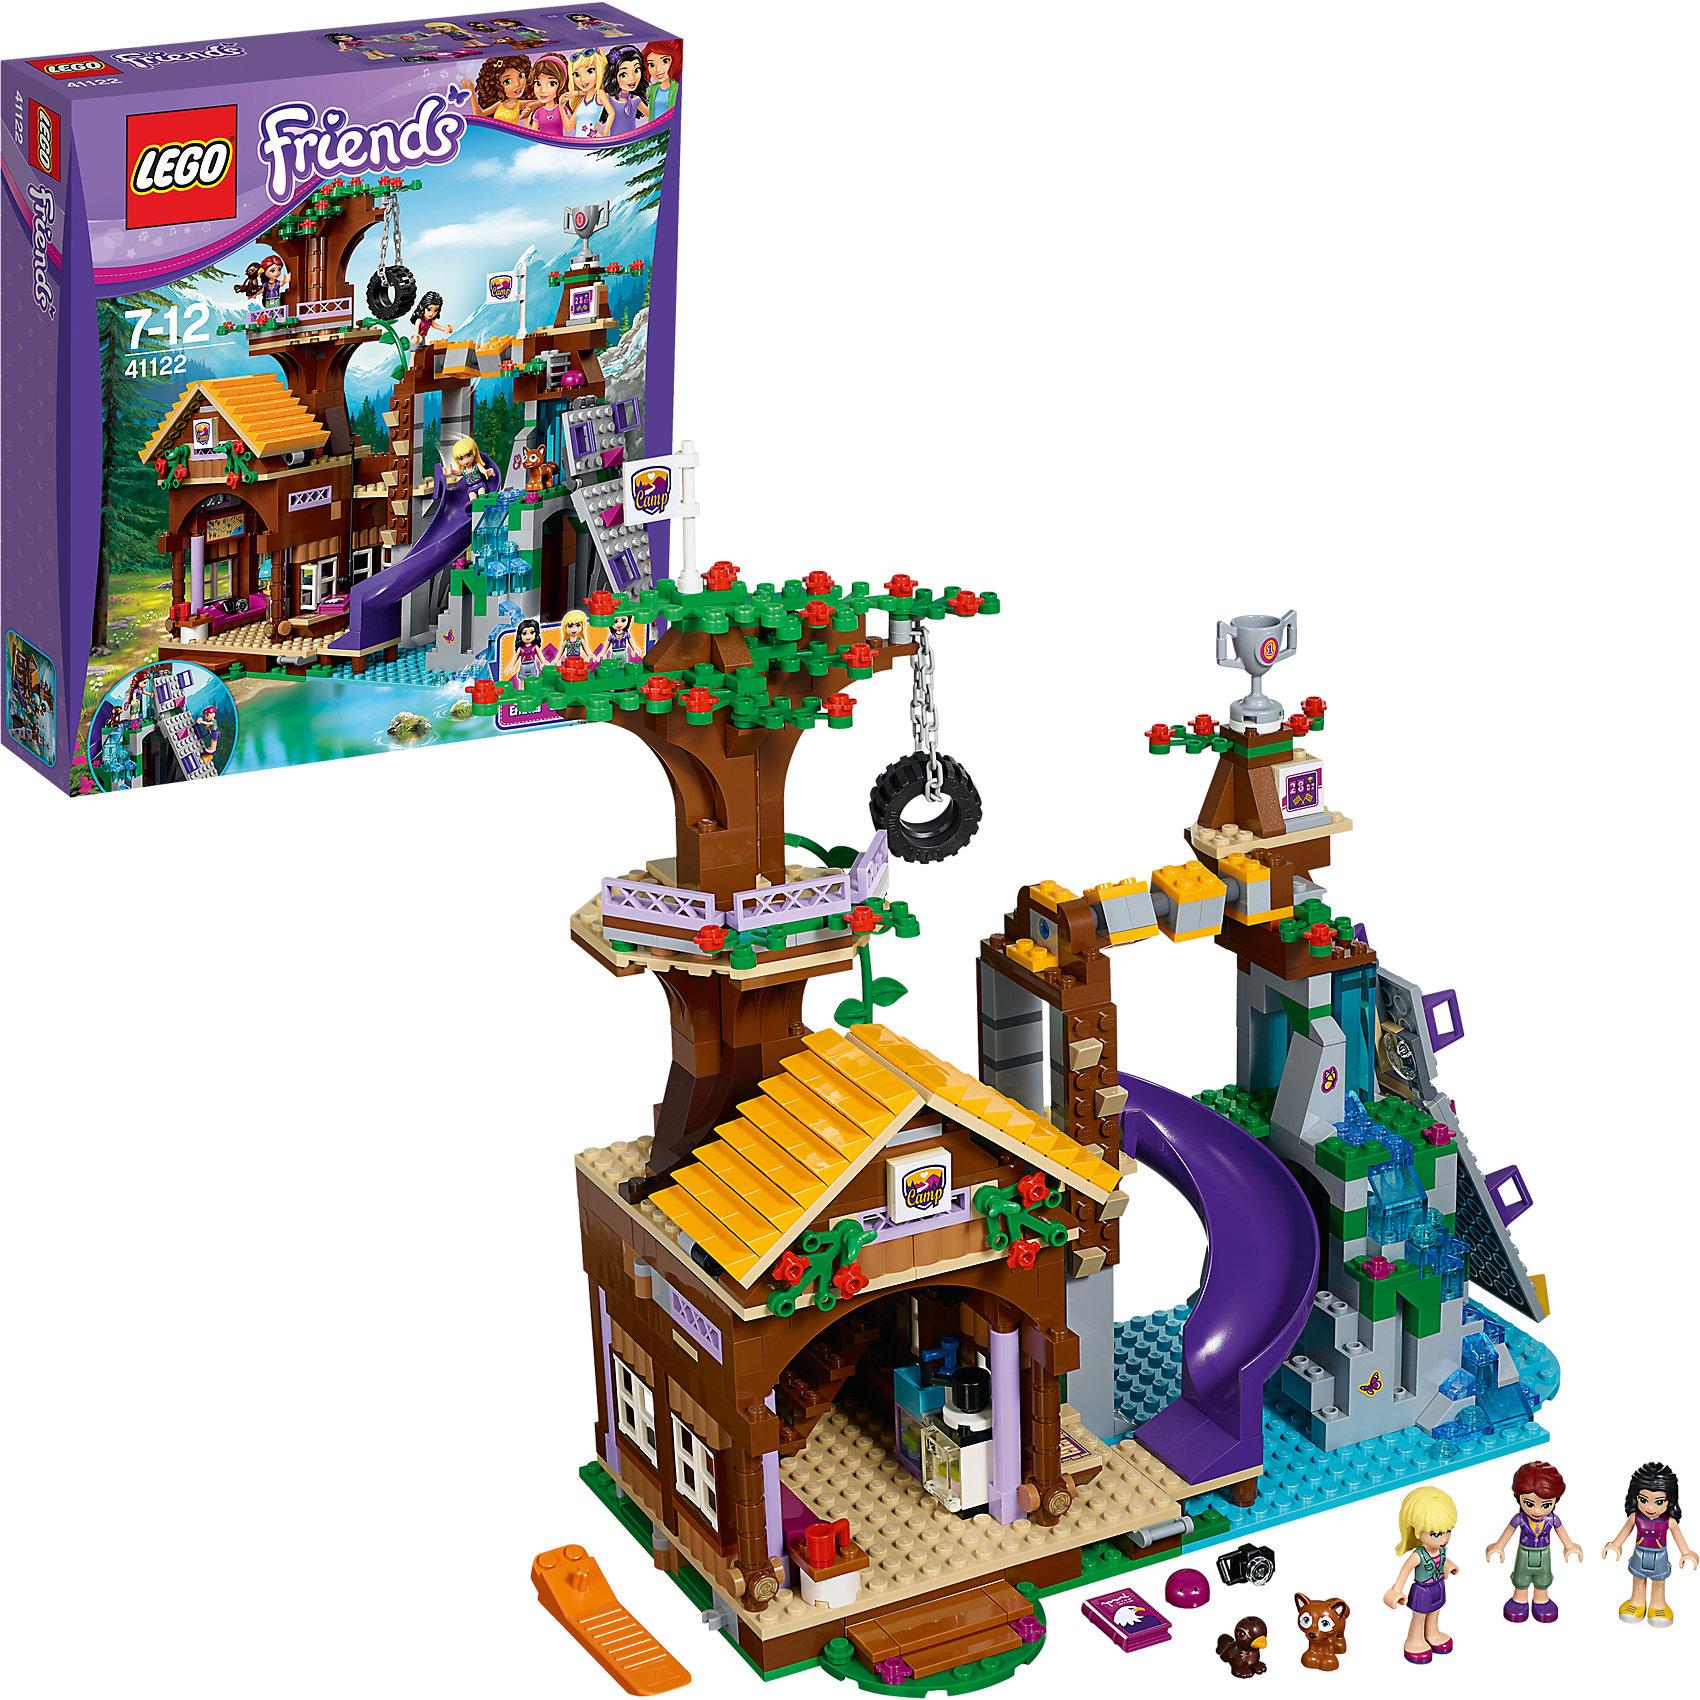 LEGO LEGO Friends 41122: Дом на дереве bela 10497 building bricks friends series adventure camp tree house 41122 emma mia figure educational toys for children gifts